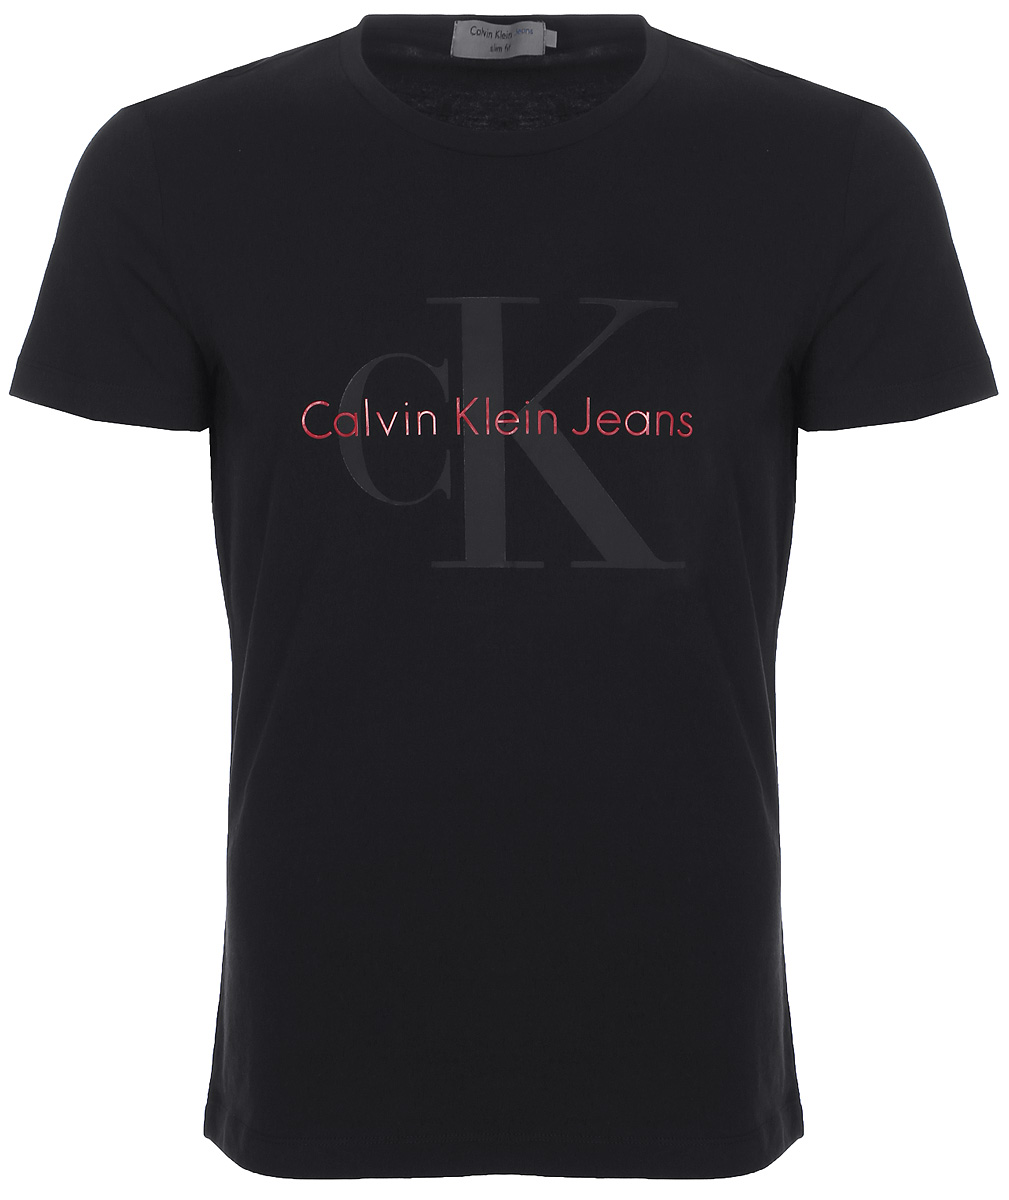 Купить Футболка мужская Calvin Klein Jeans, цвет: черный. J30J306884_0990. Размер L (48/50)